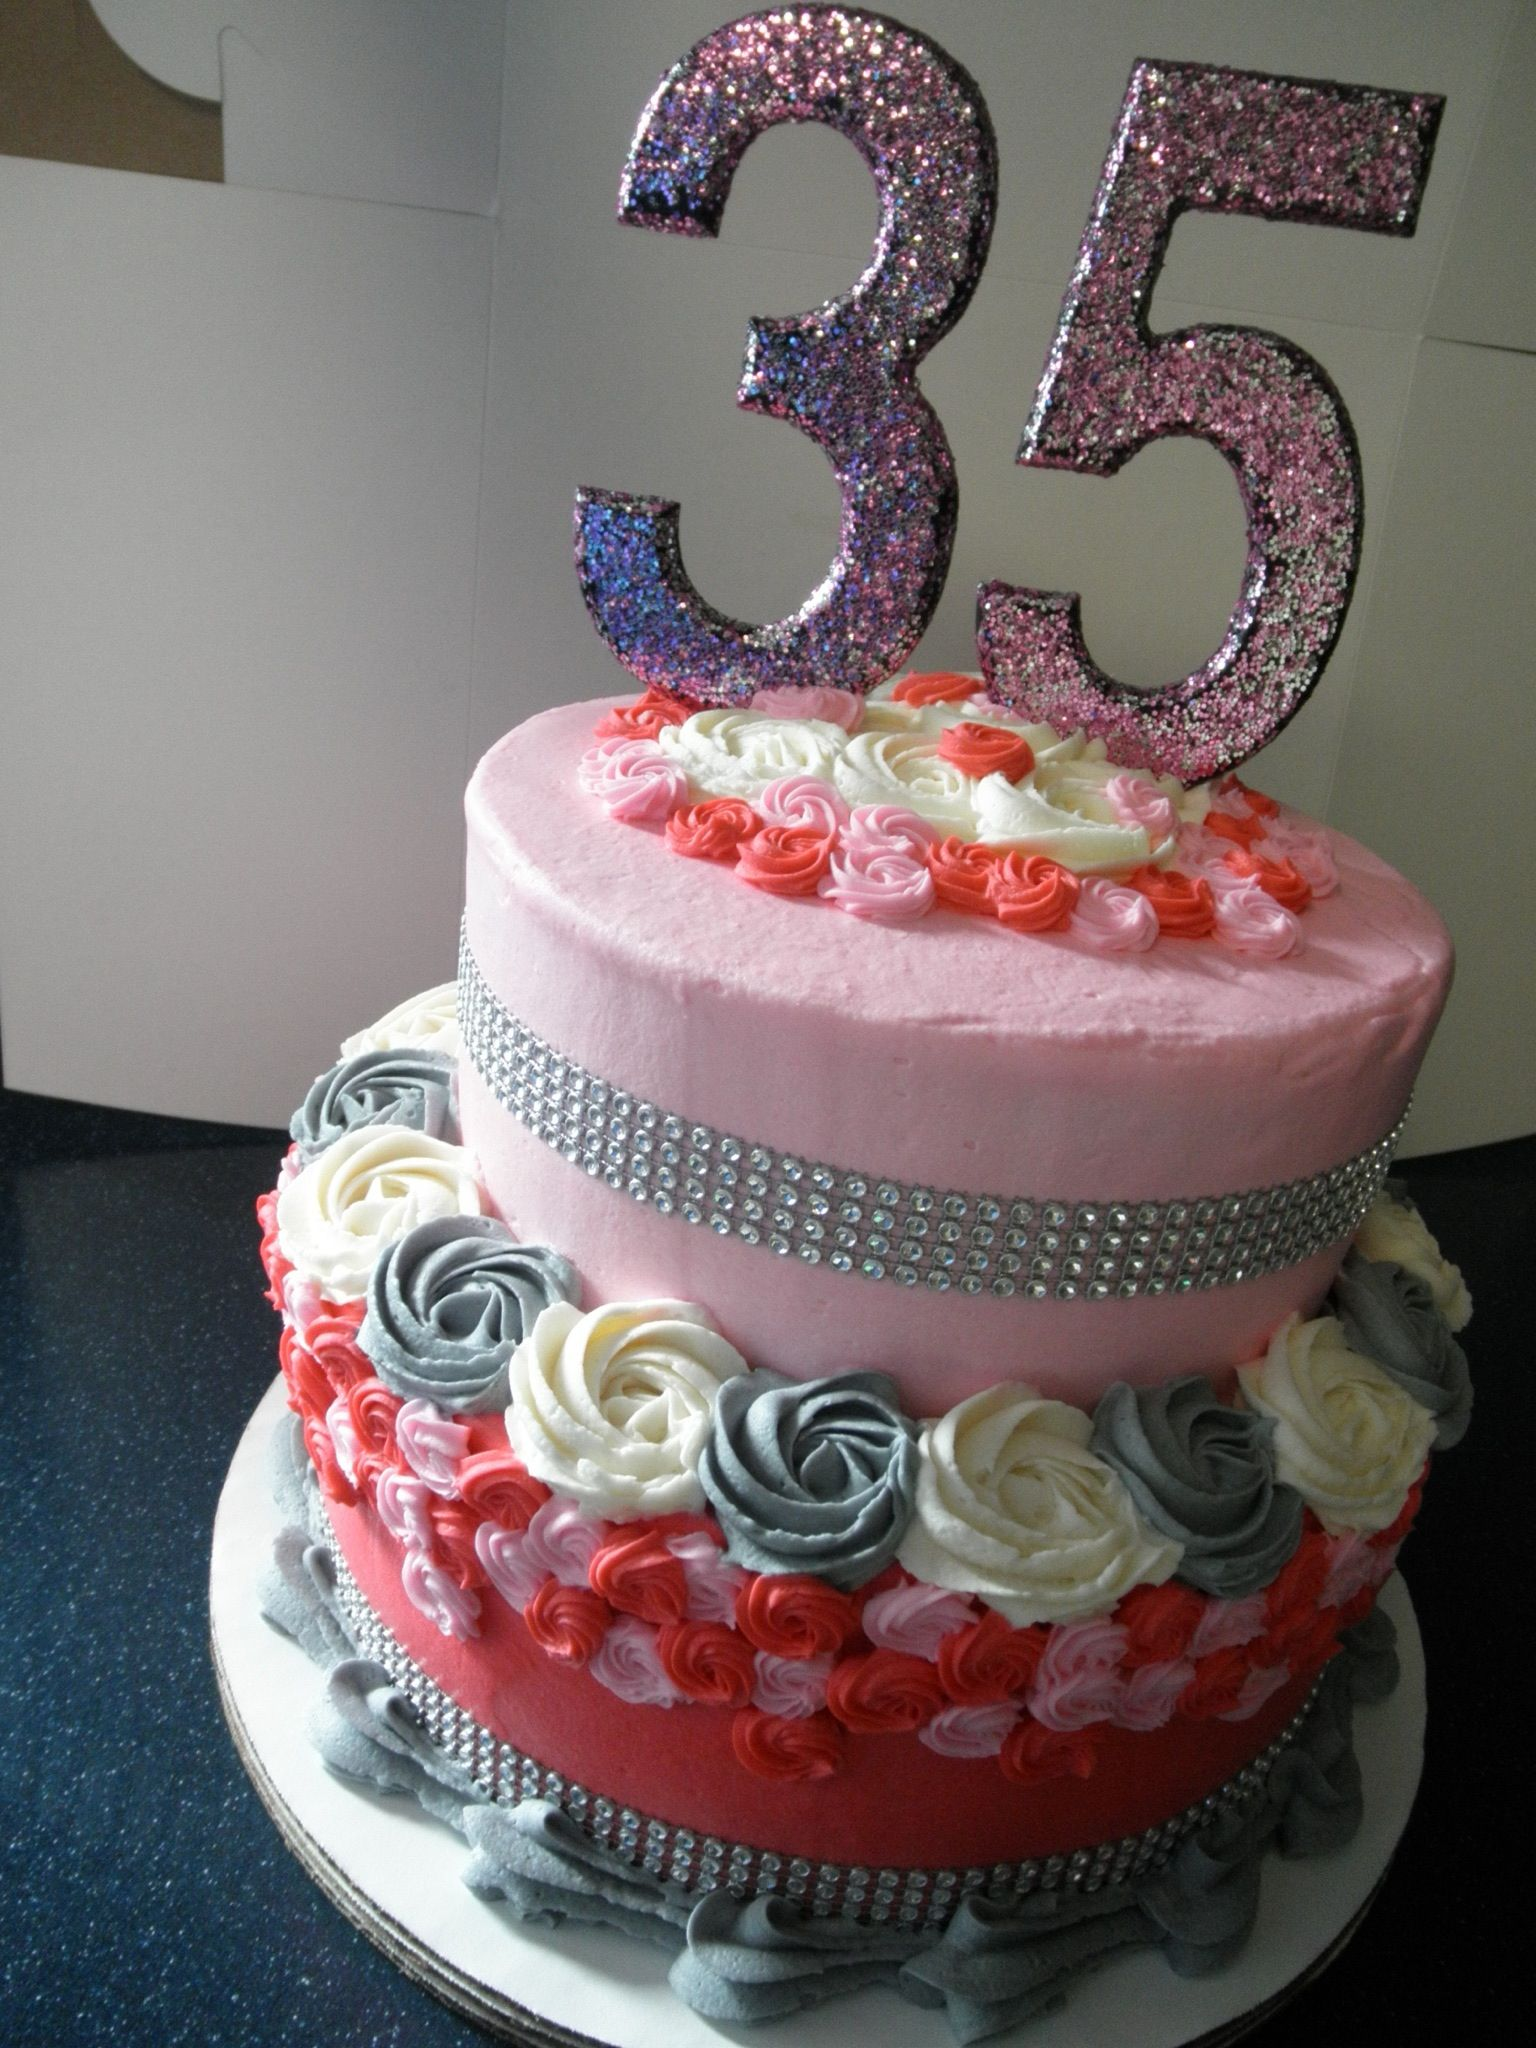 Glitz And Glam Sparkly Th Birthday Cake Wwwfacebookcom - 35th birthday cake ideas